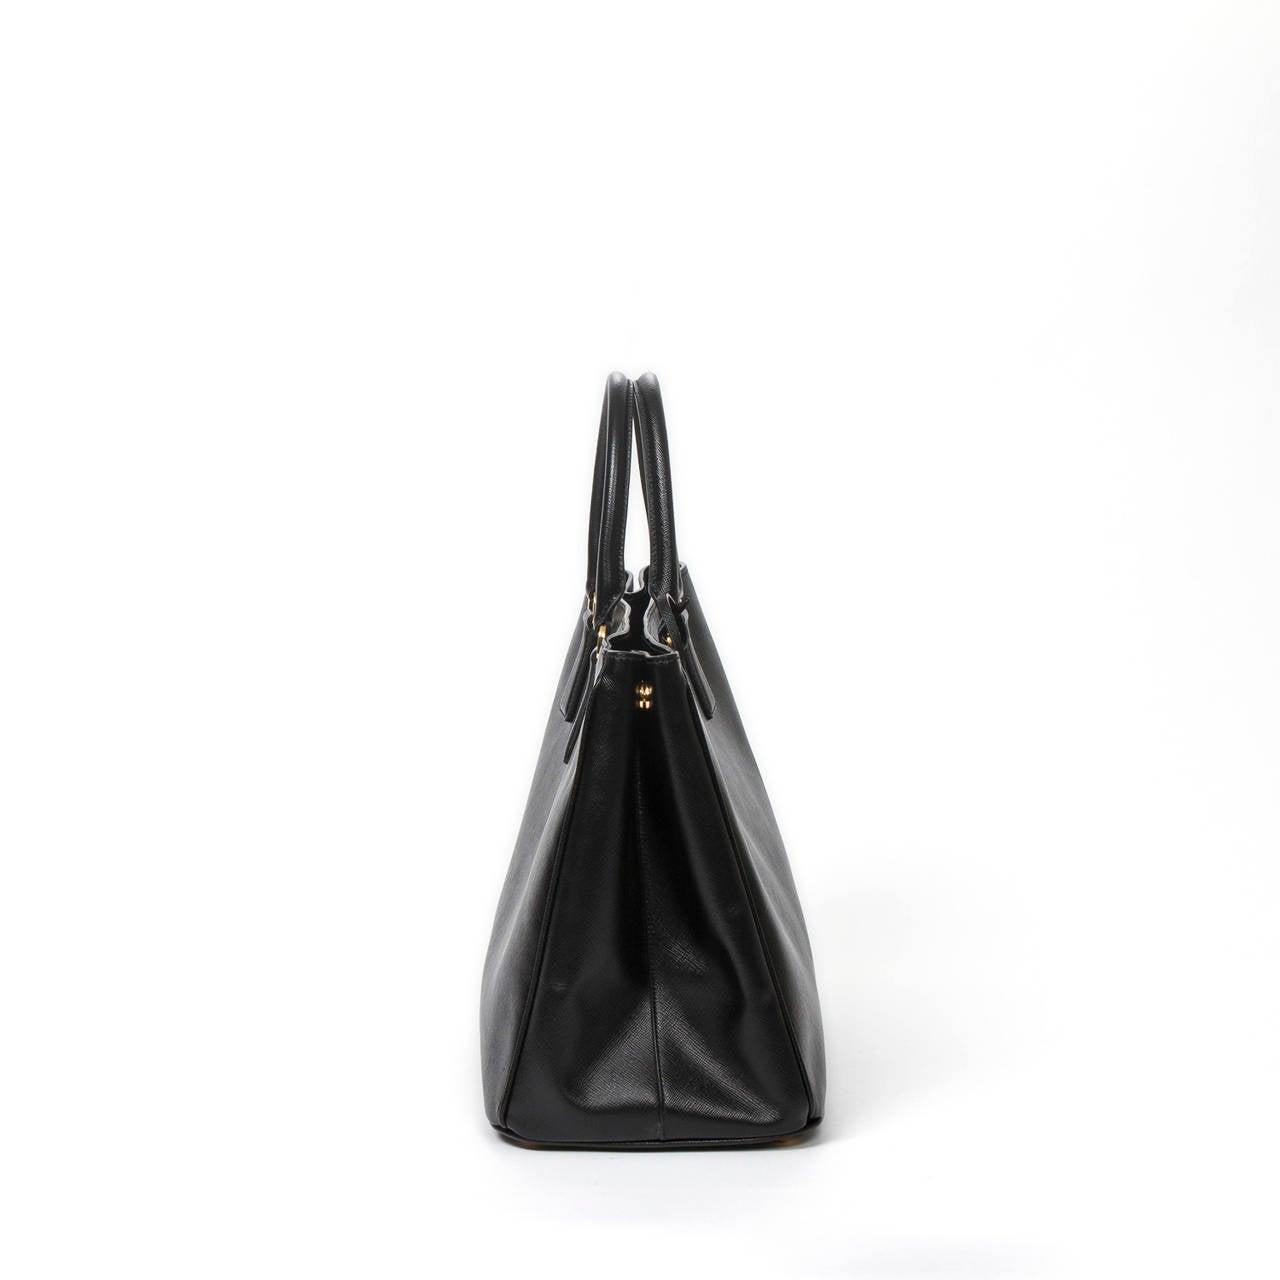 Prada Saffiano Lux Handbag Black at 1stdibs